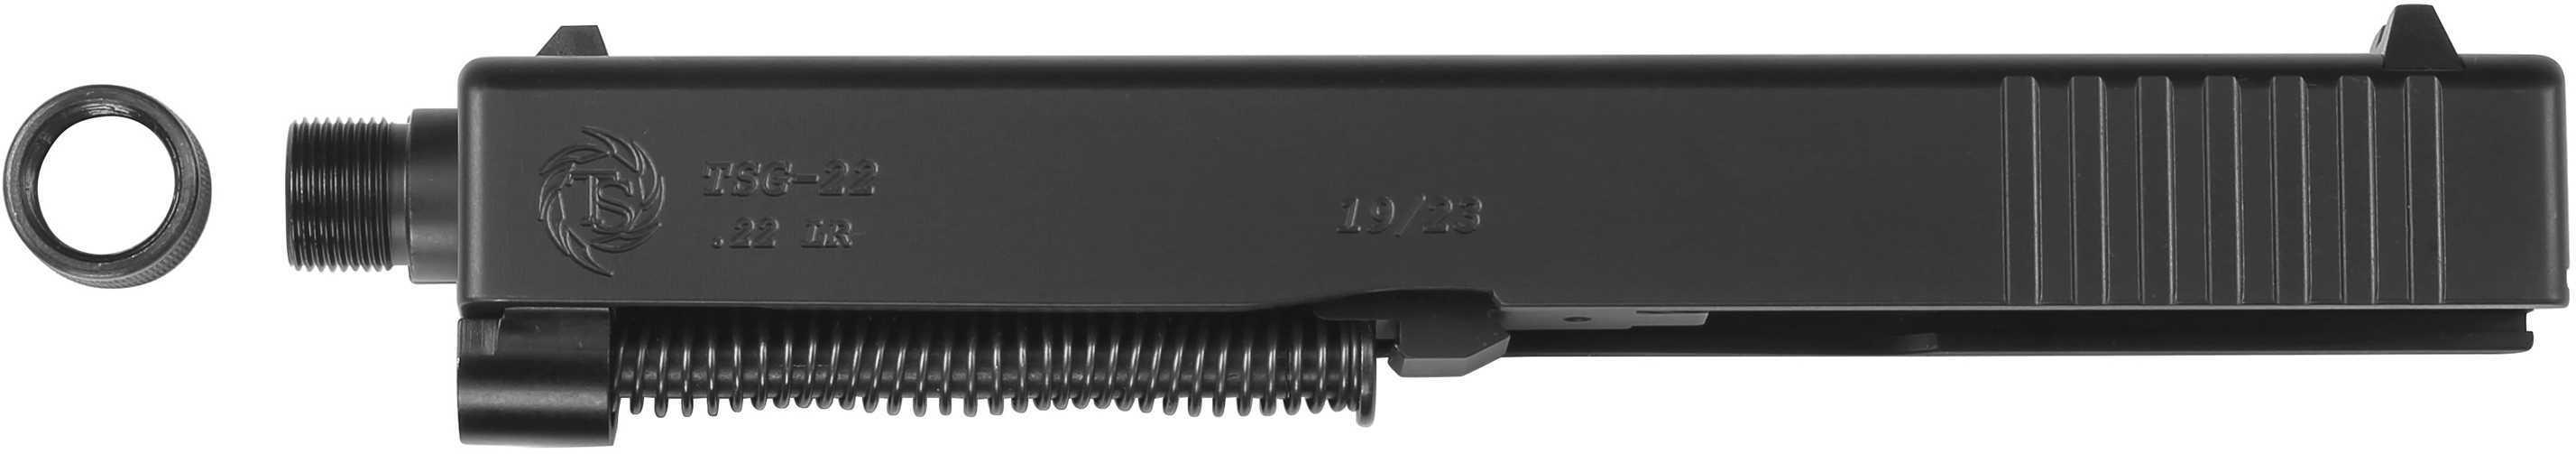 TACSOL TSG-22 for Glock 19 22LR Thrd Conversion Kit